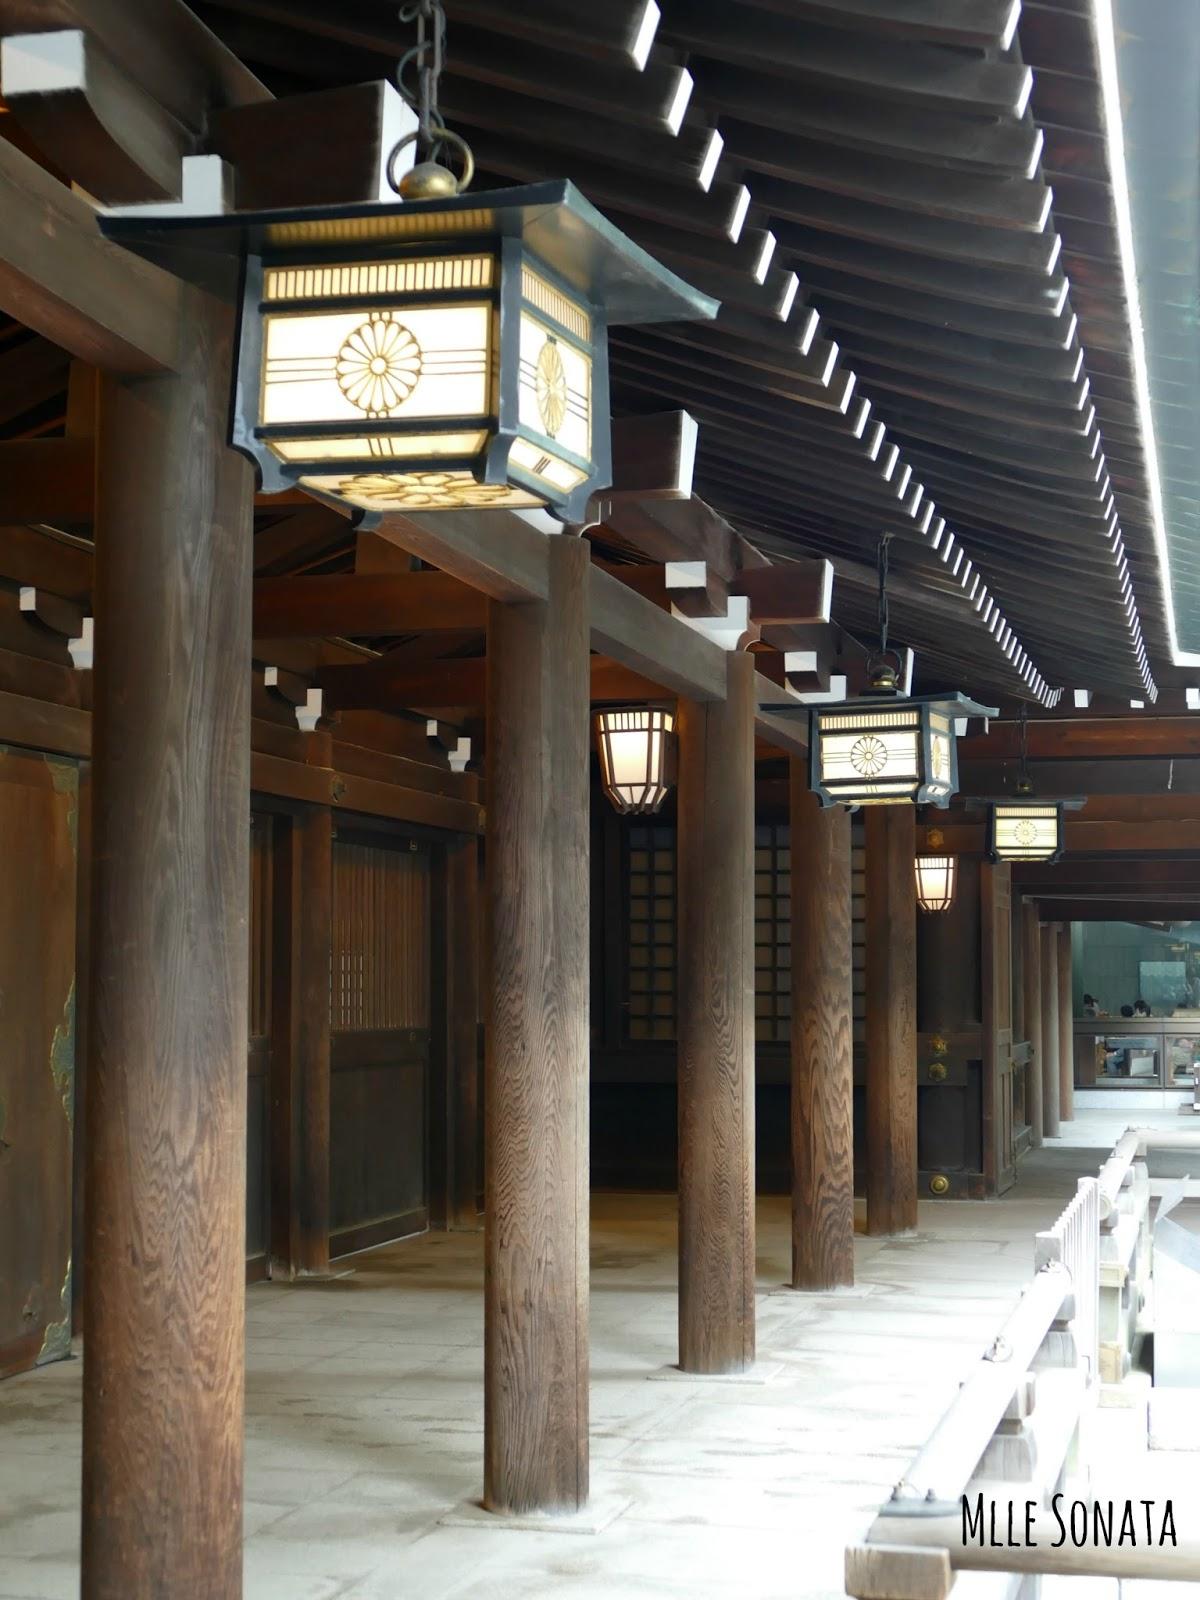 Temple Meiji Jingu à Tokyo.